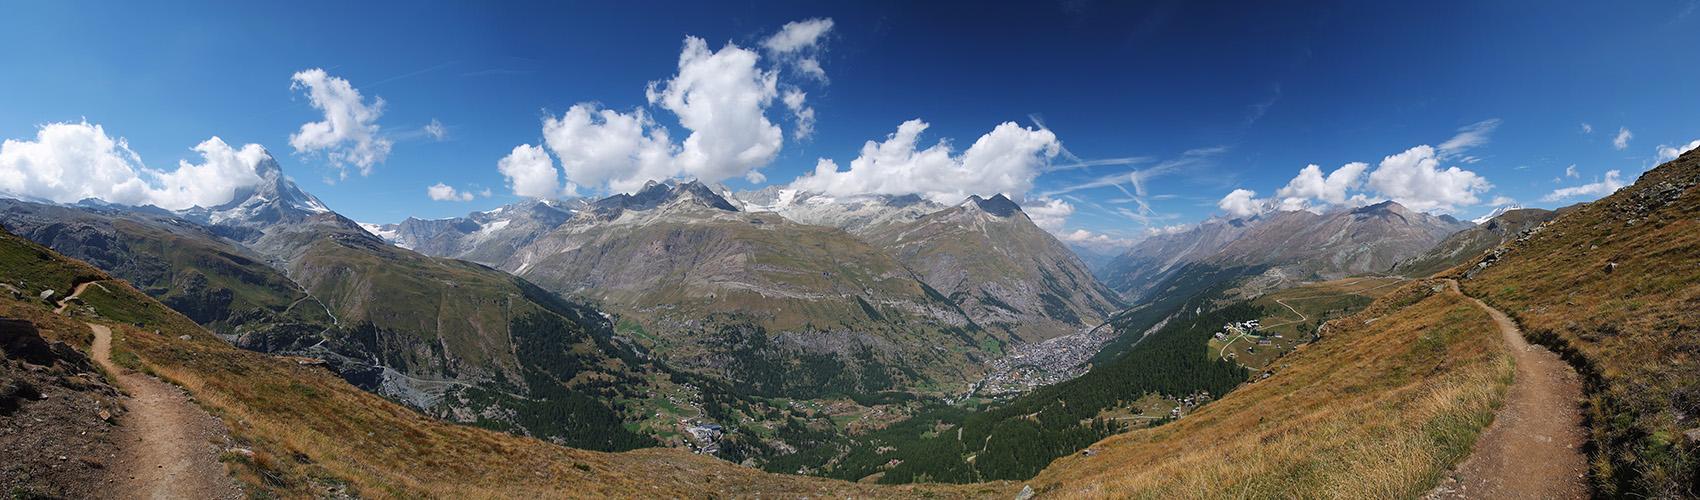 Wanderweg-Panorama am Matterhorn